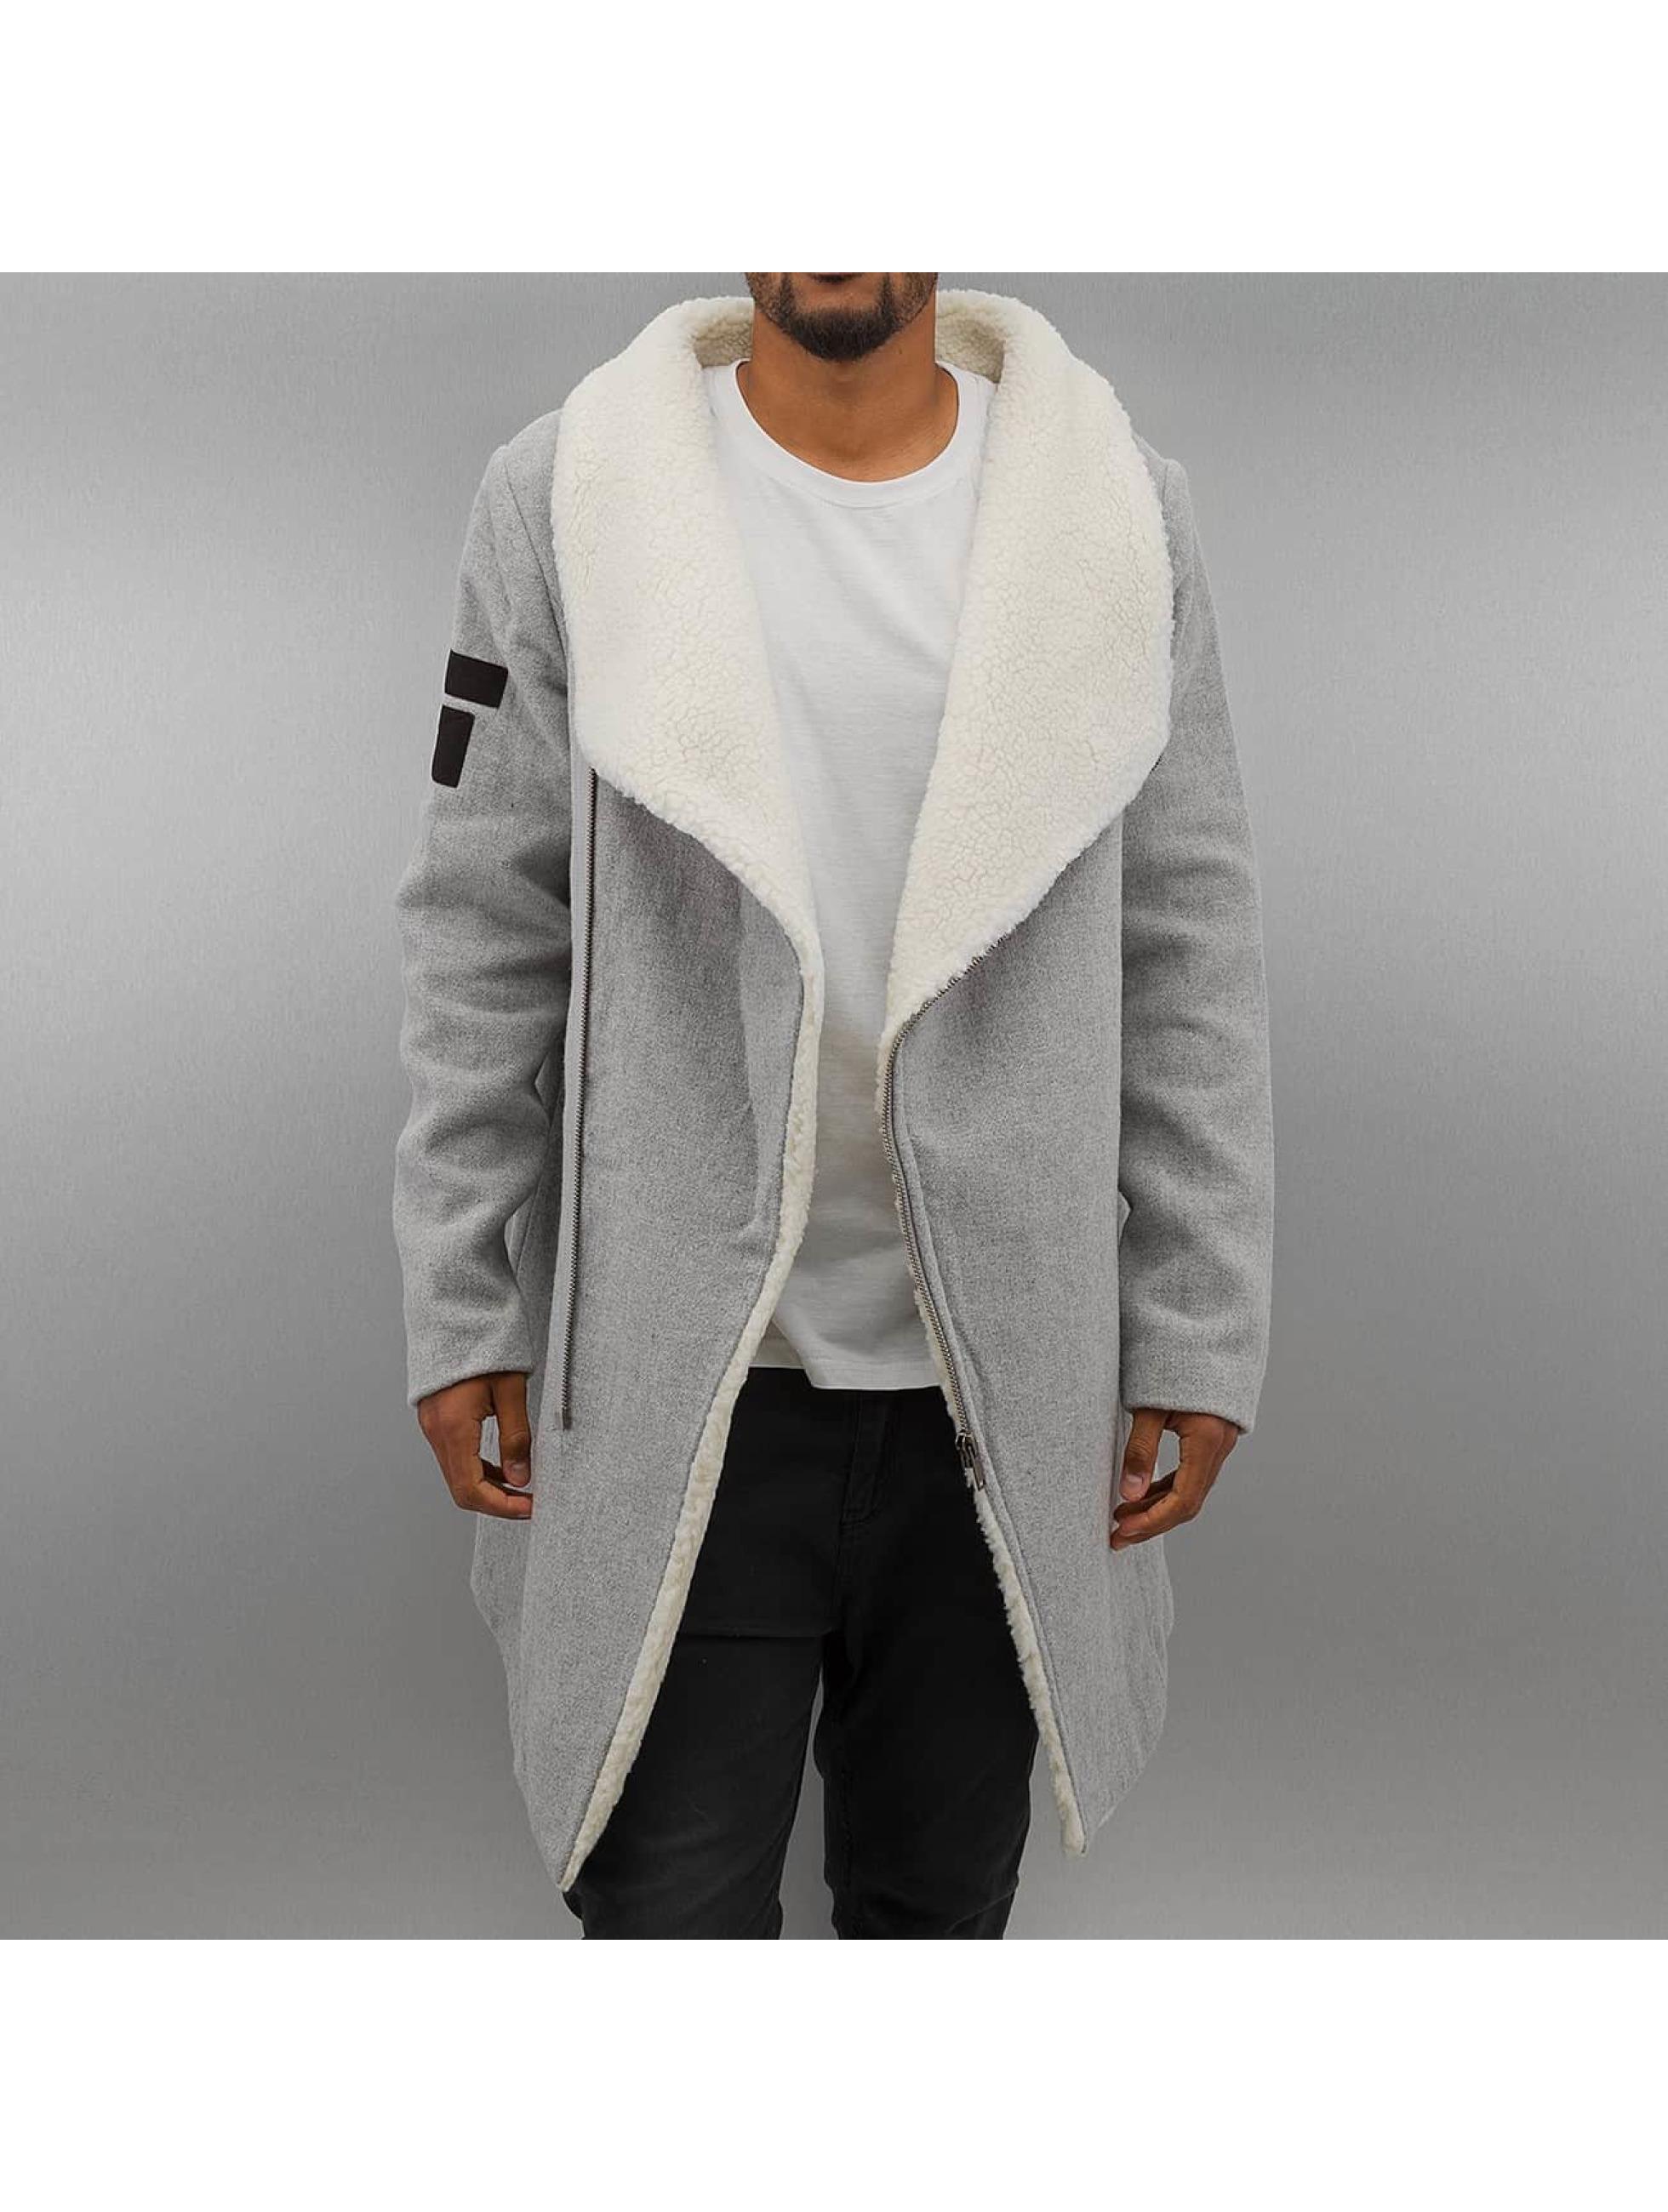 Mantel Konye in grau